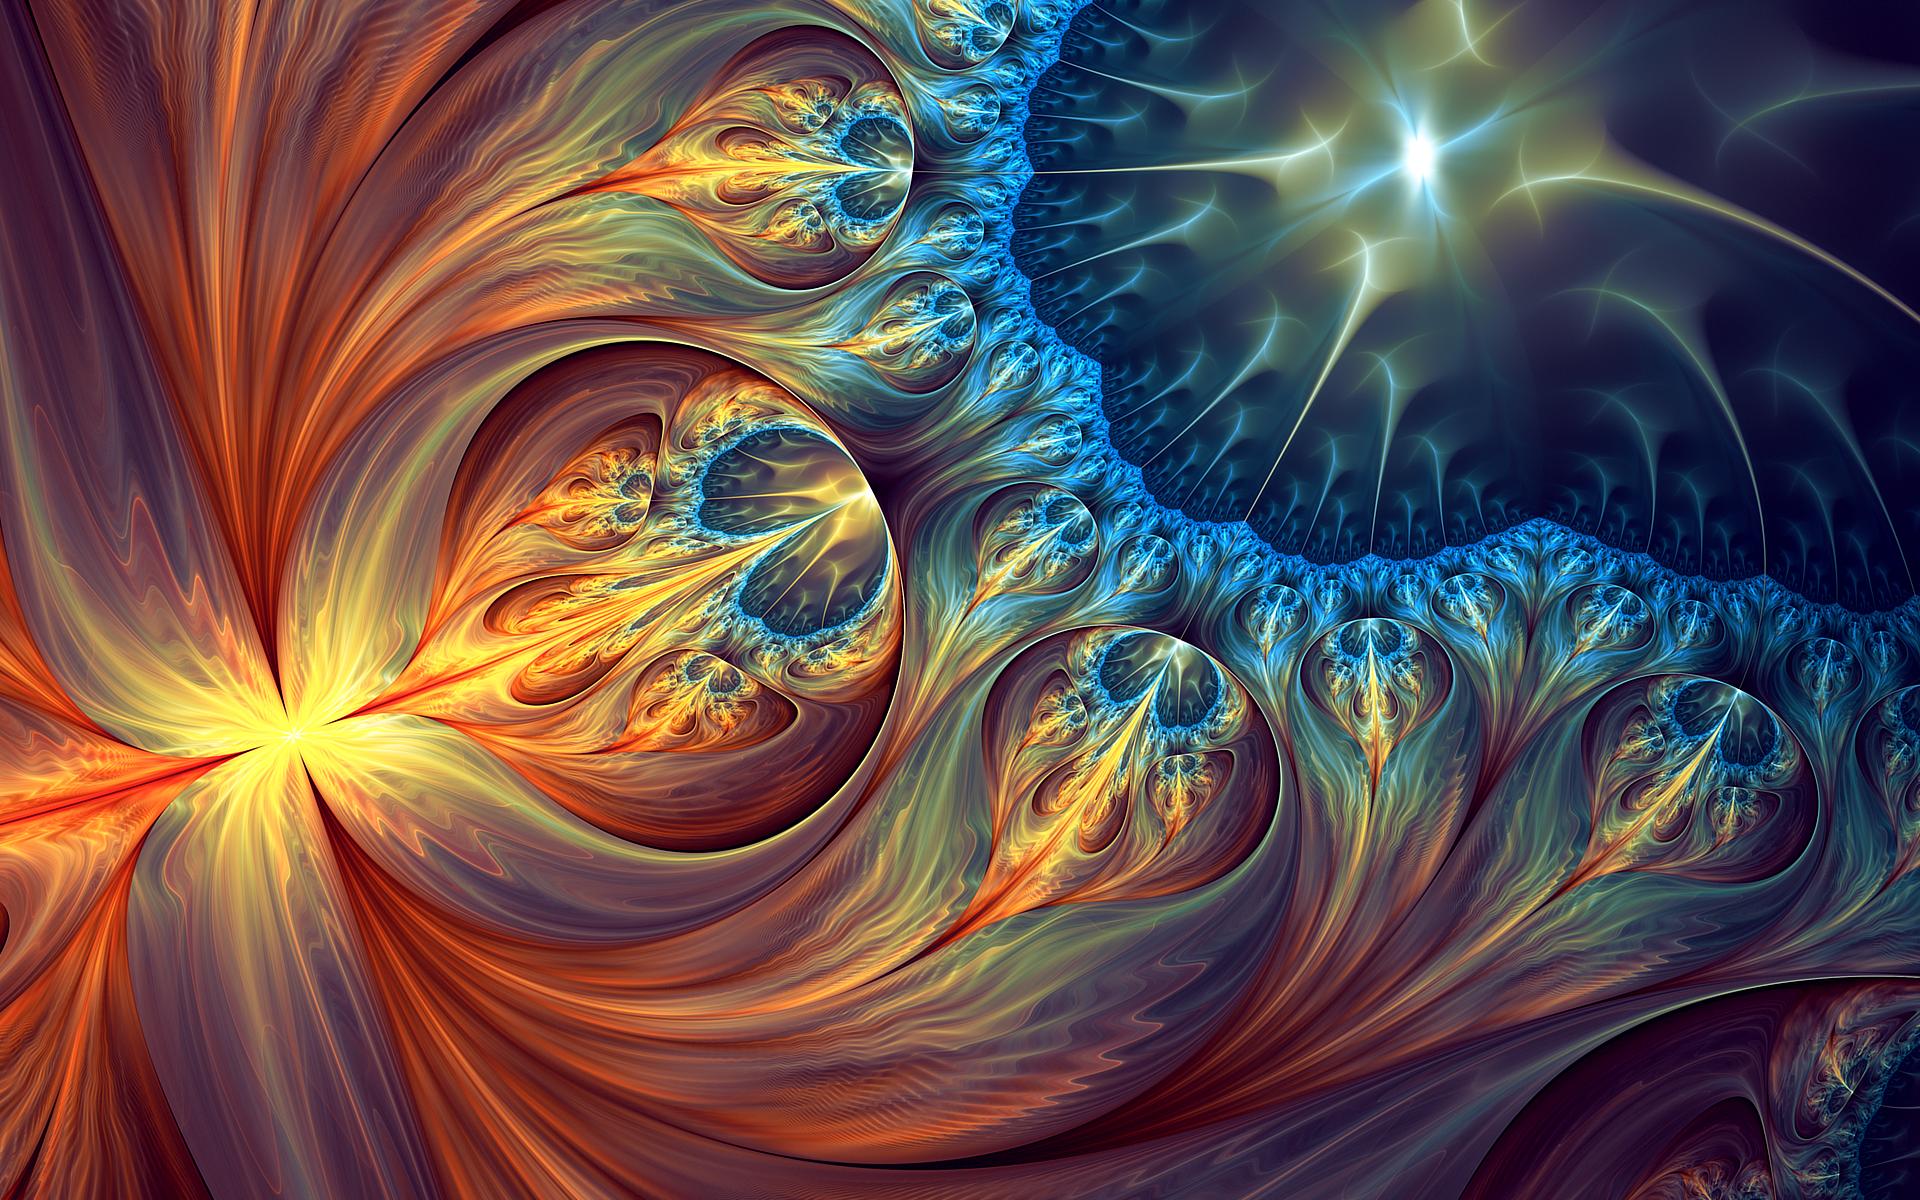 Abstract - Fractal  Abstract Colors Digital Art Artistic Wallpaper